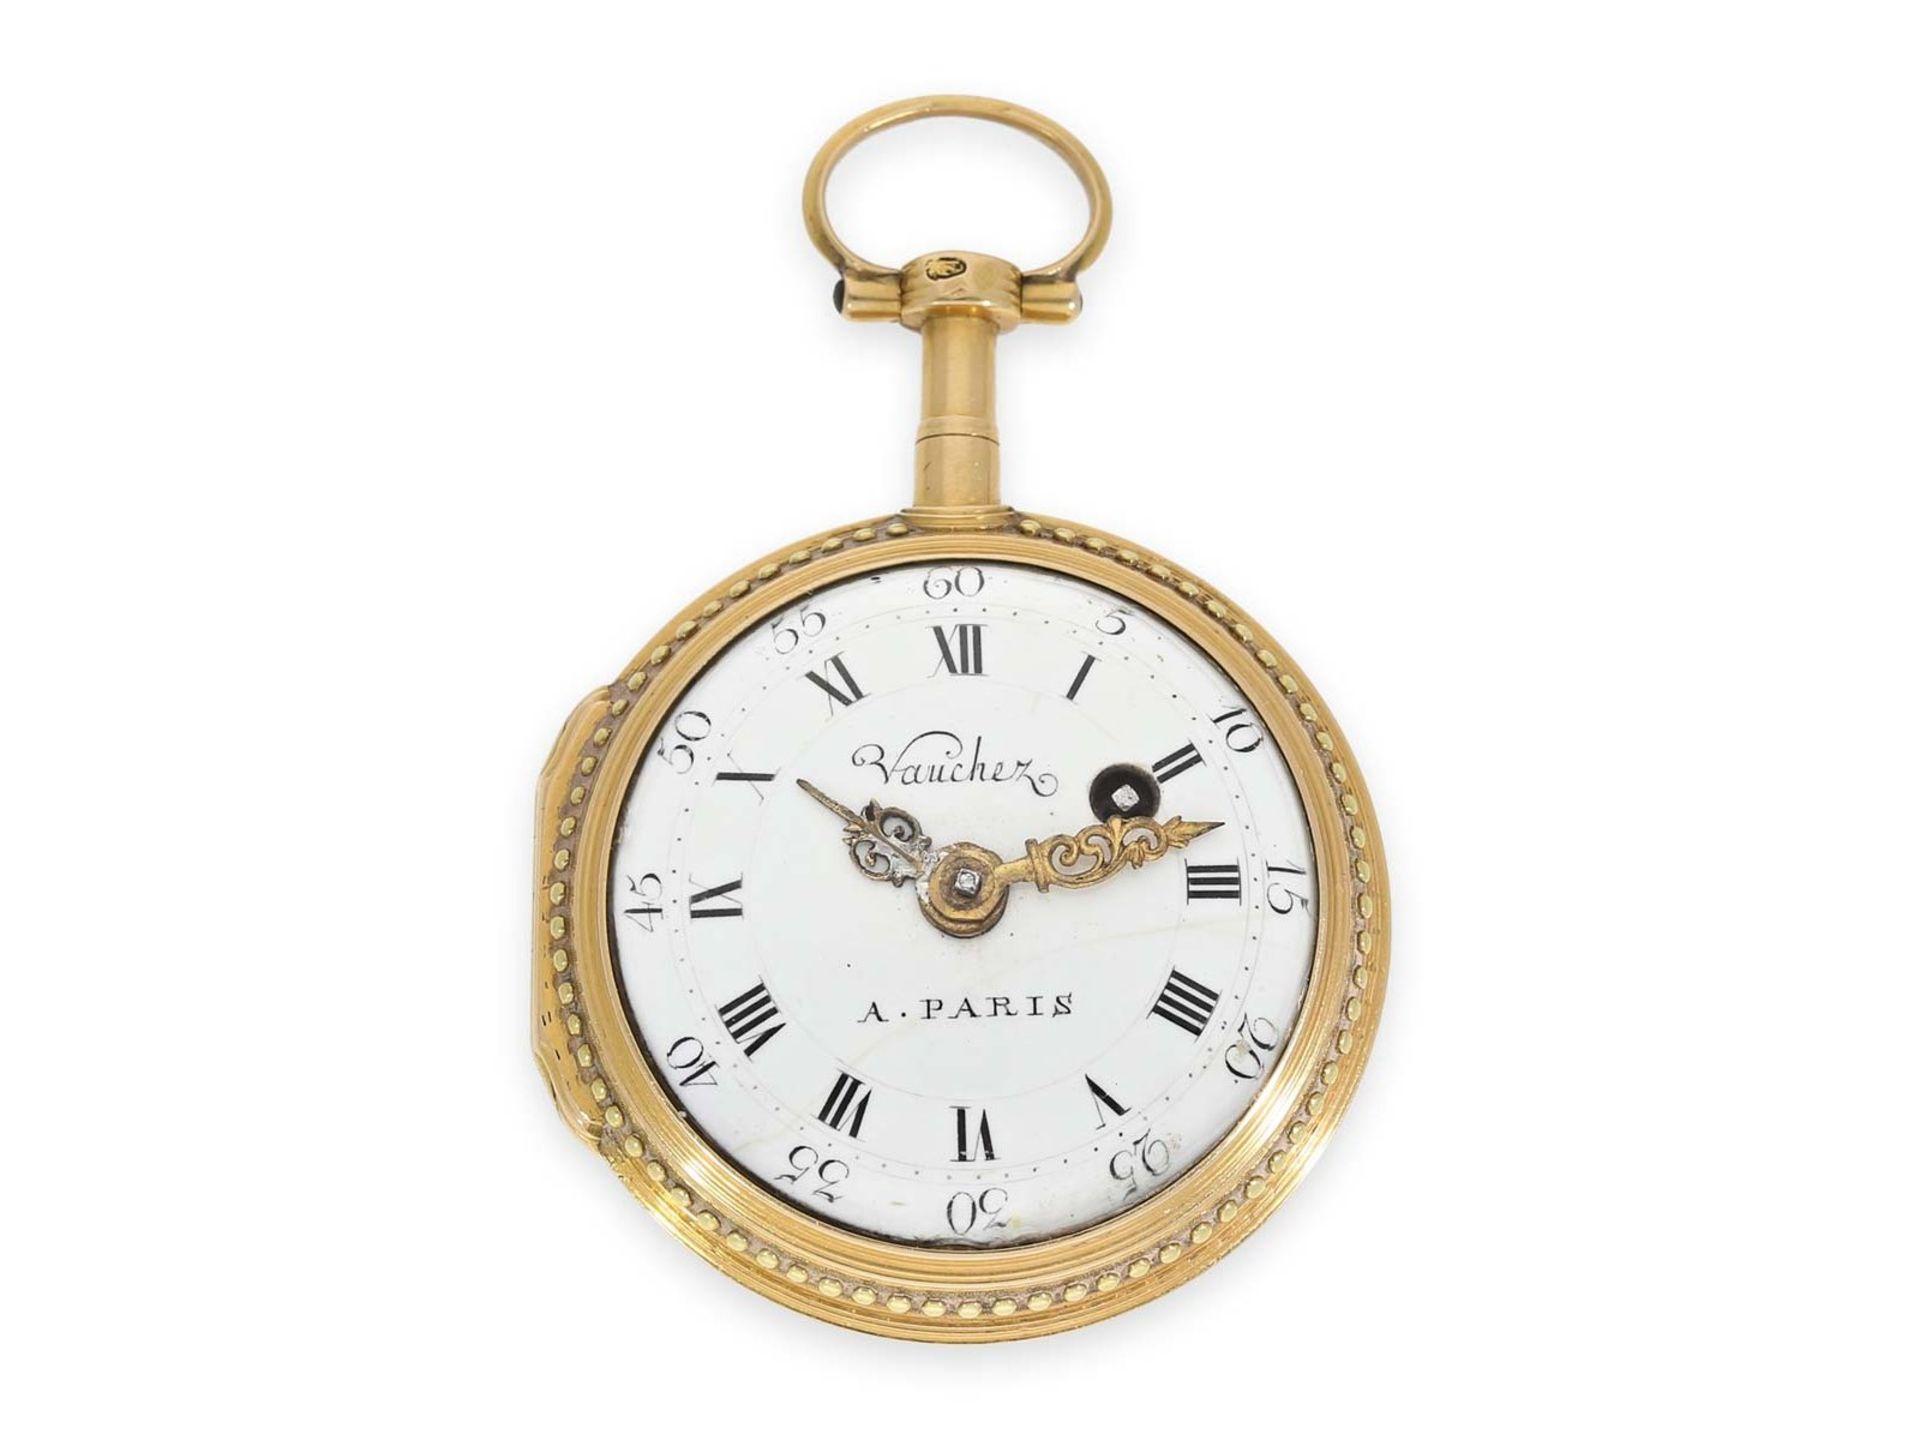 Pocket watch: gold/ enamel verge watch with finest enamel painting, excellent quality, Vaucher Paris - Bild 2 aus 3